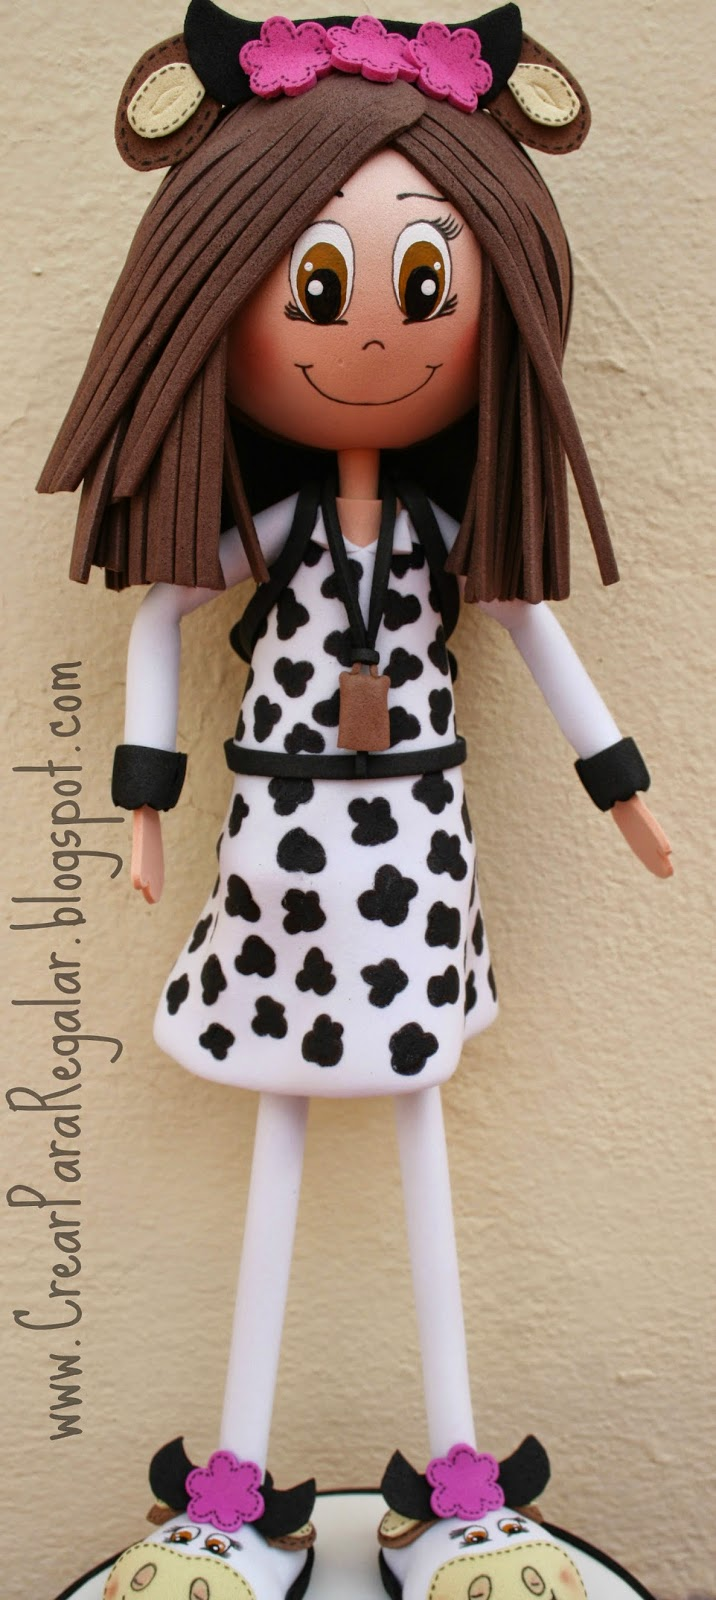 fofucha vestida de vaca